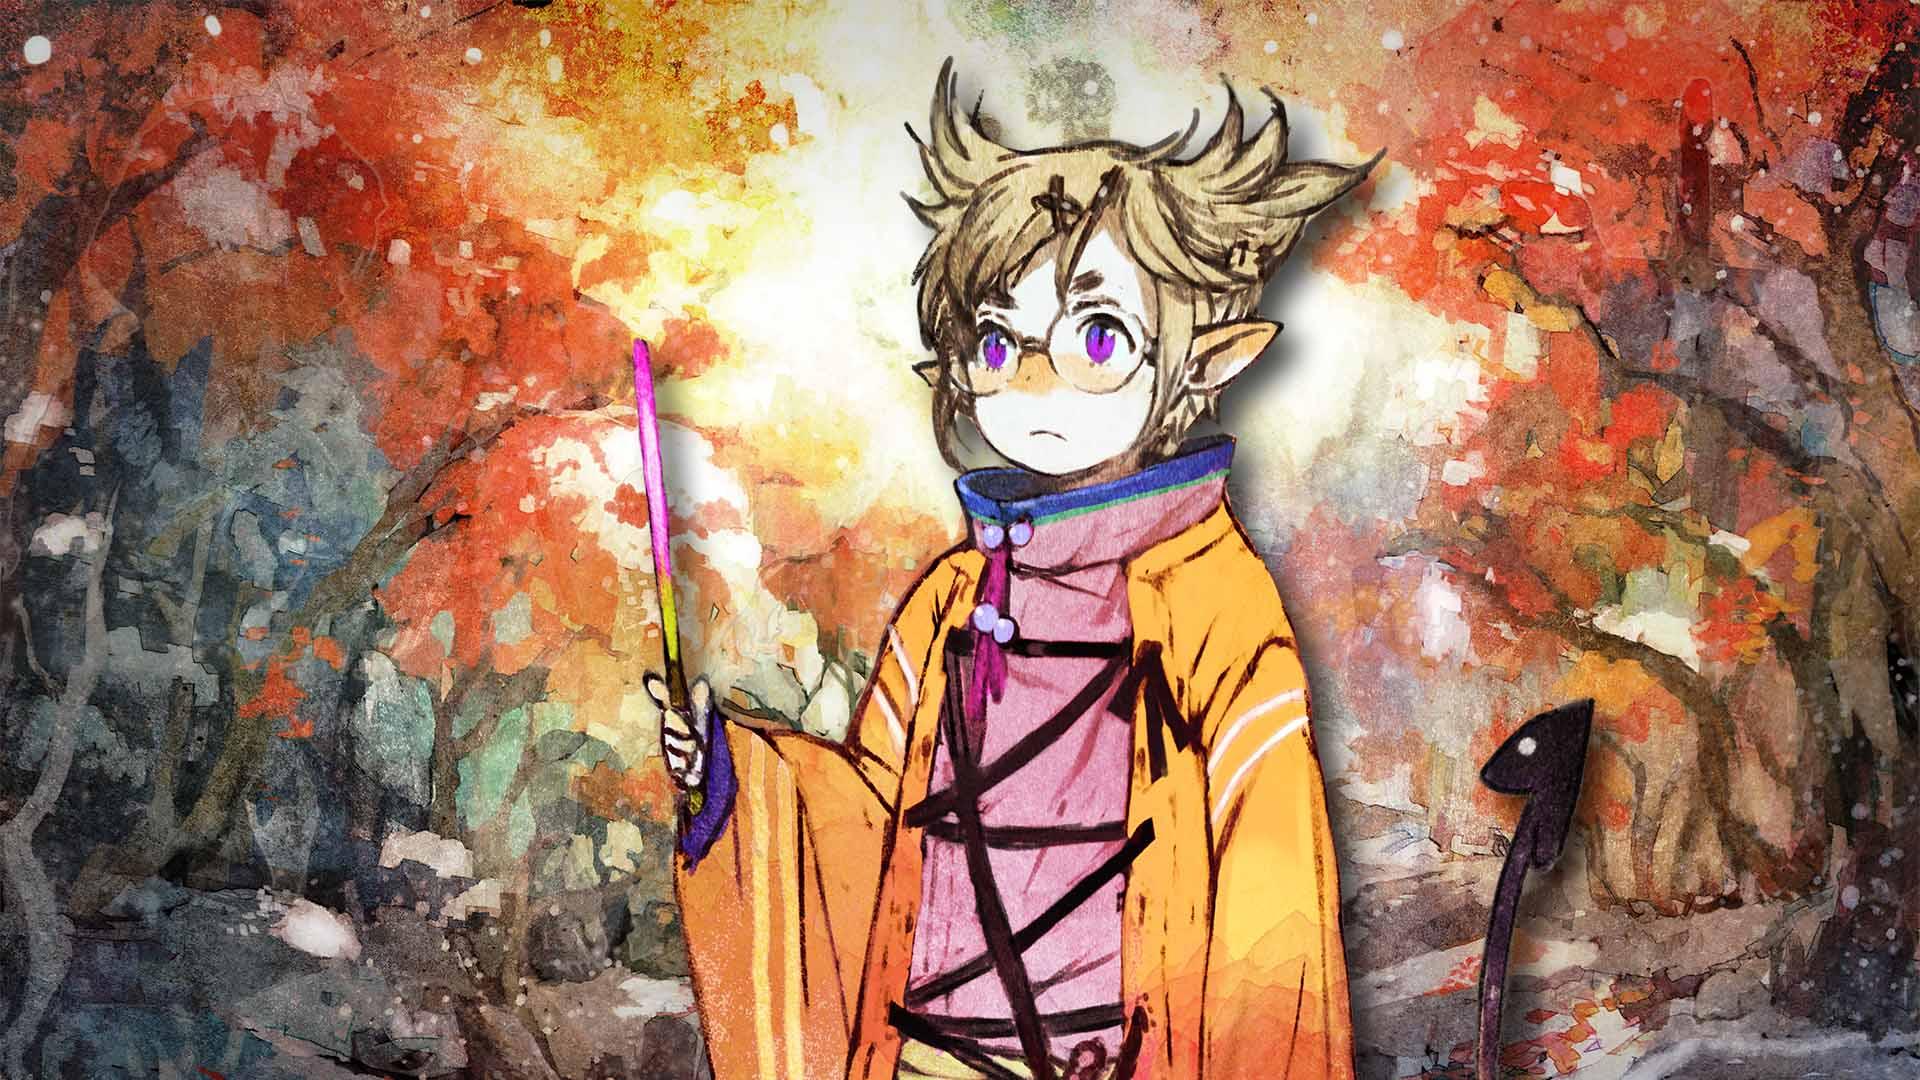 I Am Setsuna Wallpaper 009 Kir